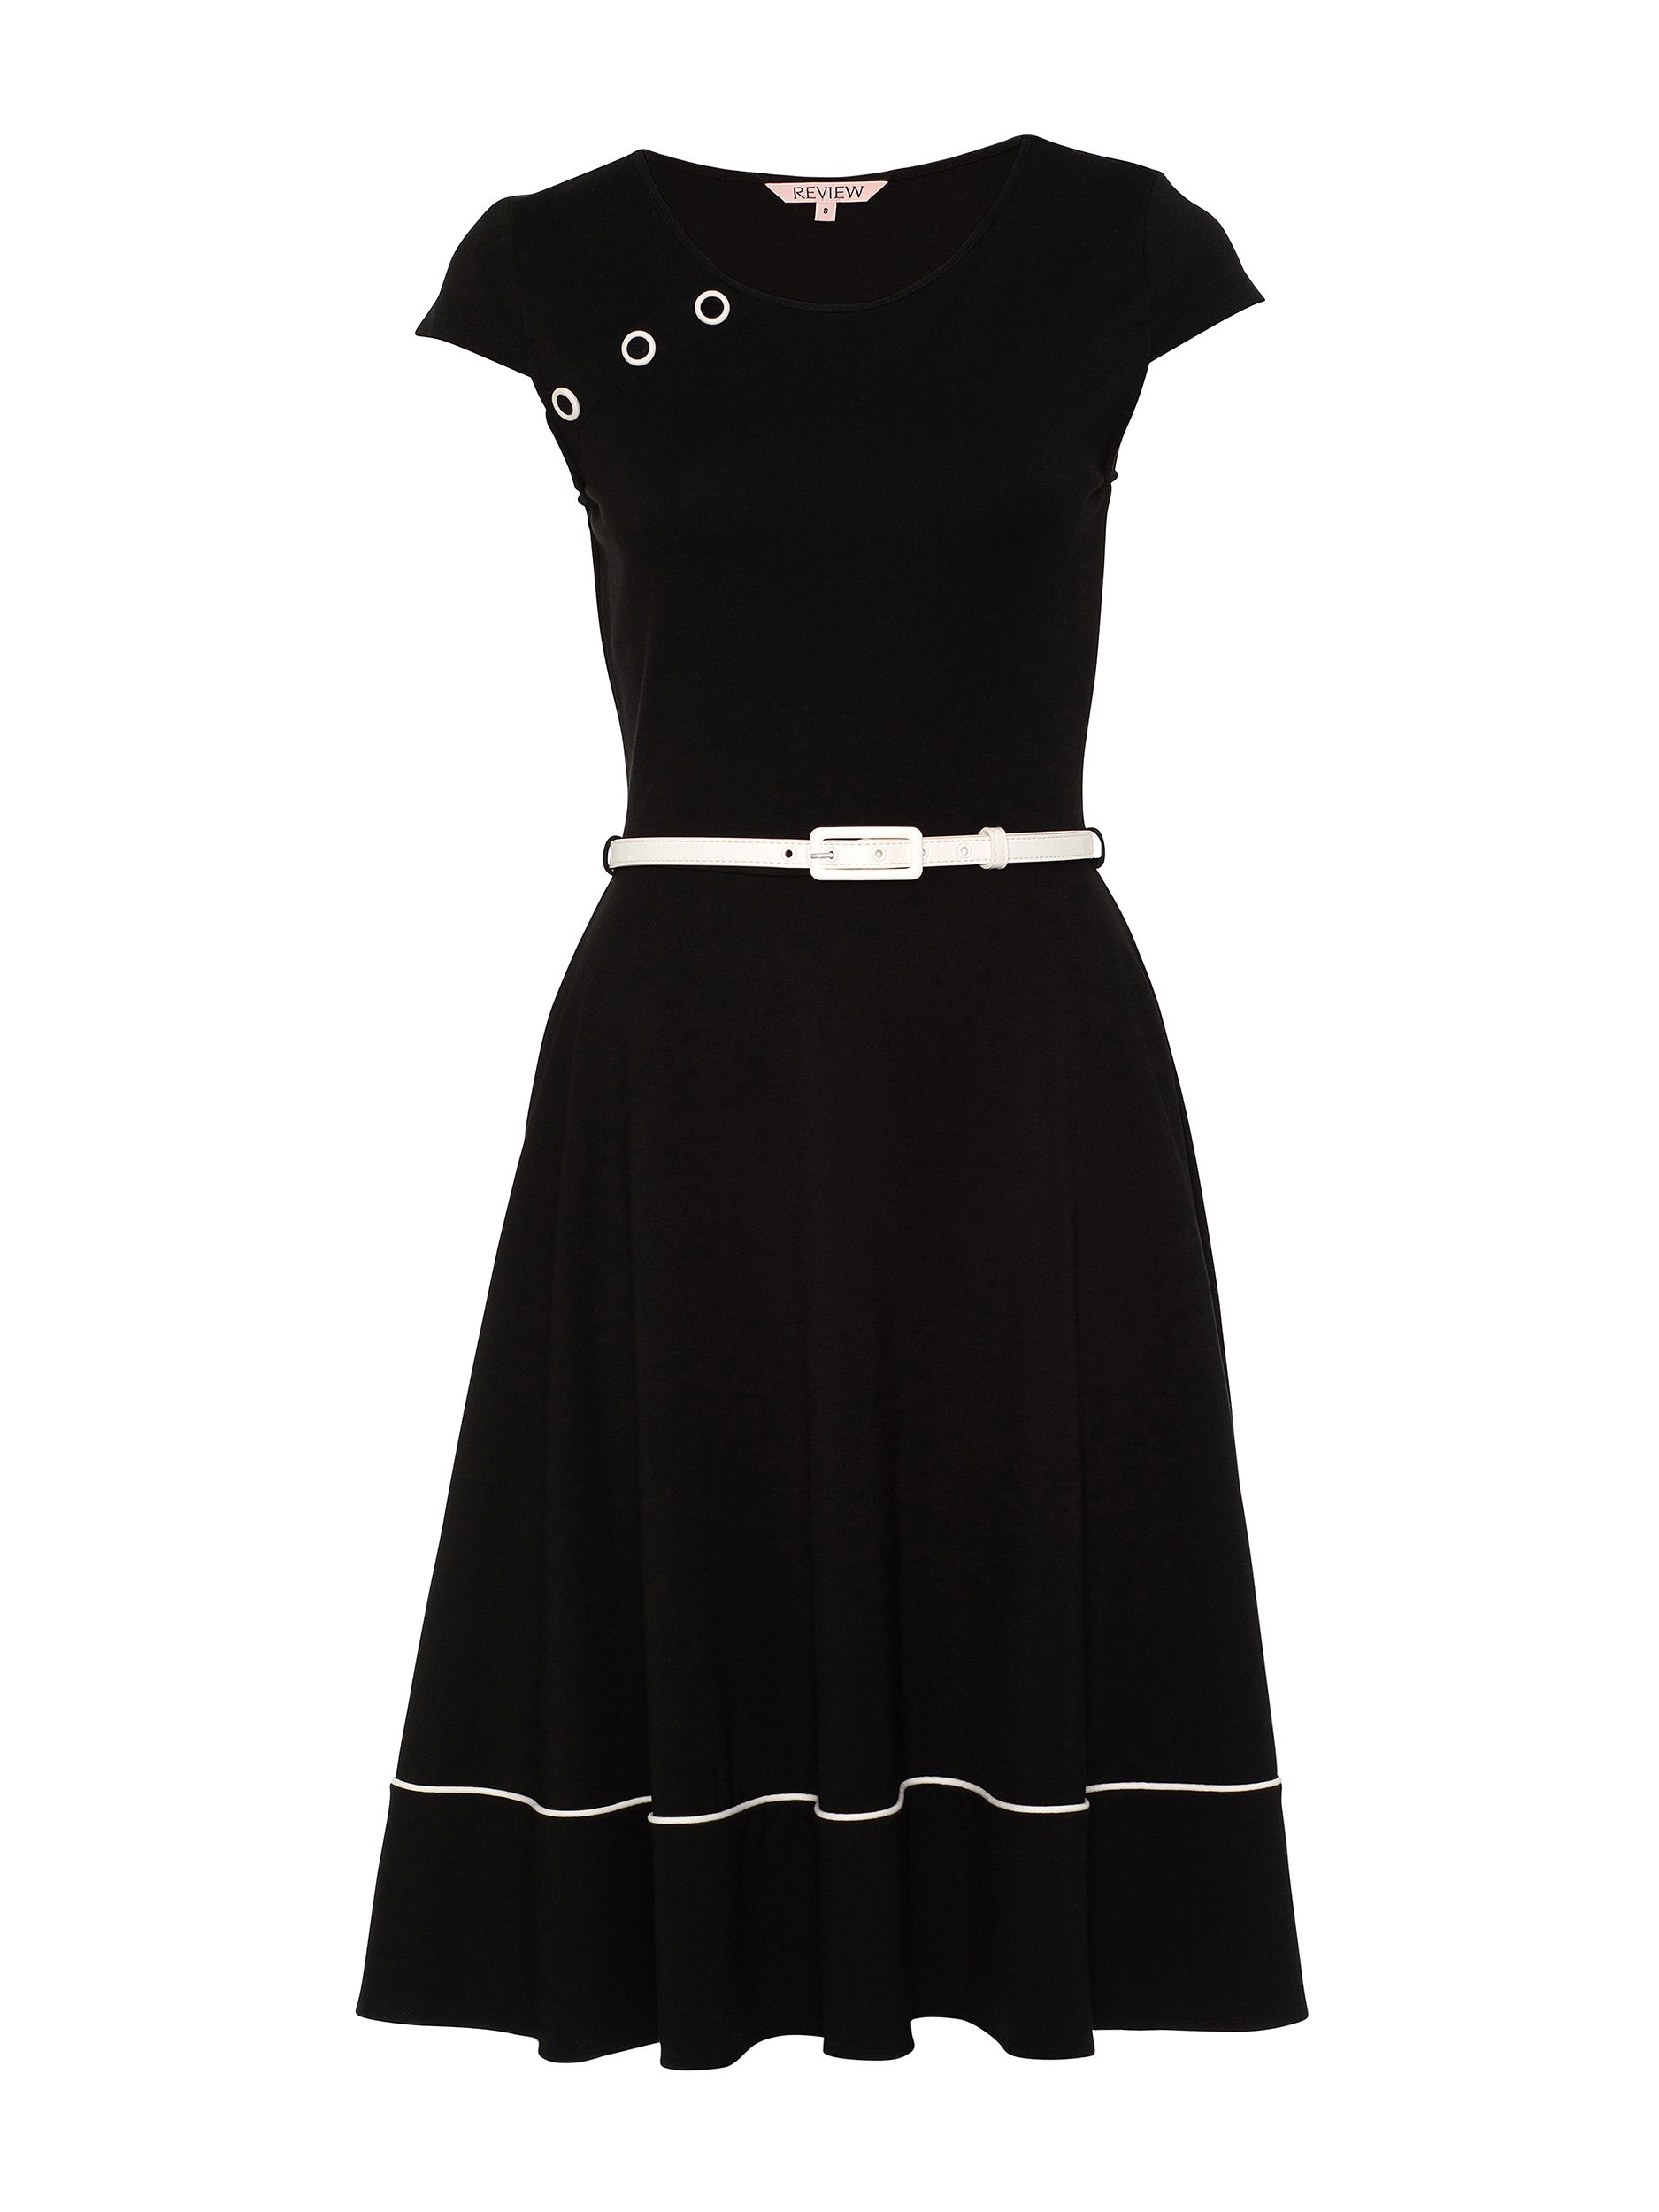 Loren Dress Review Australia Dressy Summer Dresses Review Dresses Review Clothing [ 2500 x 1875 Pixel ]